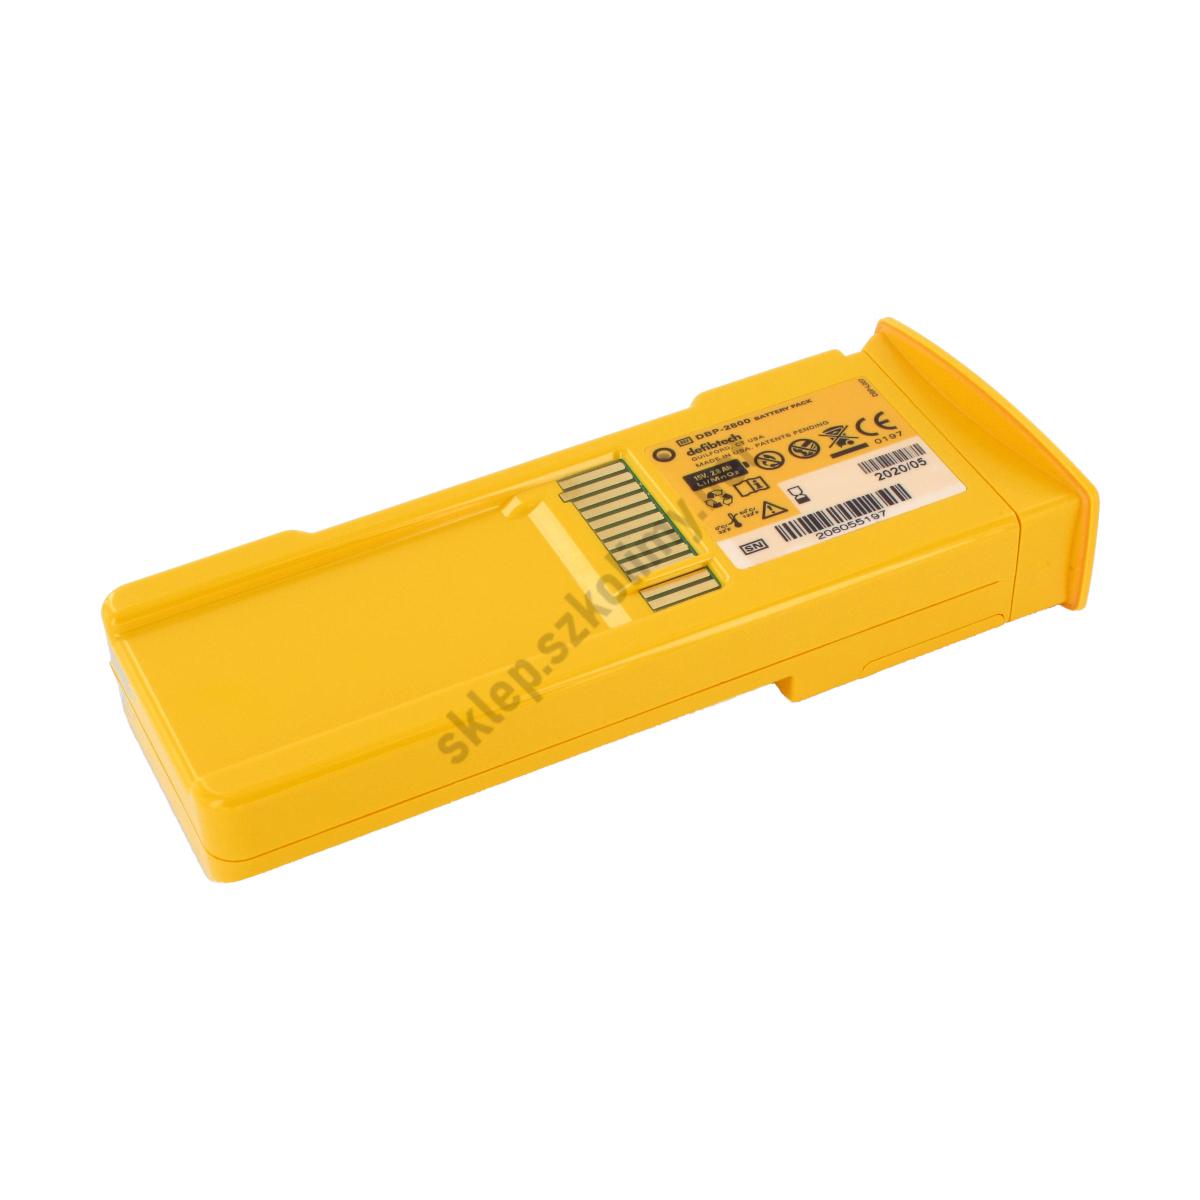 Bateria 7-letnia do defibrylatora Defibtech Lifeline